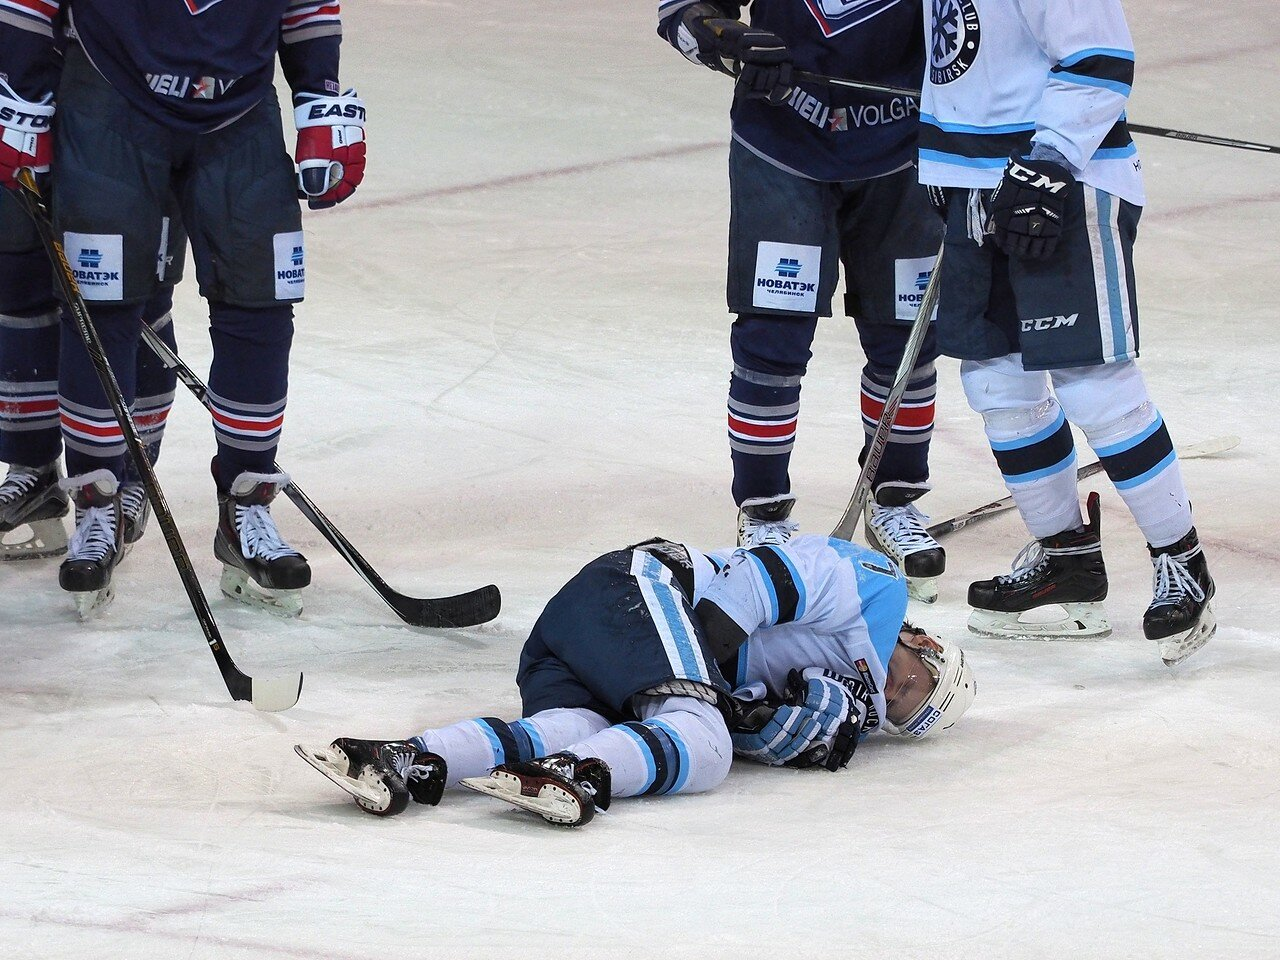 96Плей-офф 2016 Восток 1/2 Металлург - Сибирь 10.03.2016